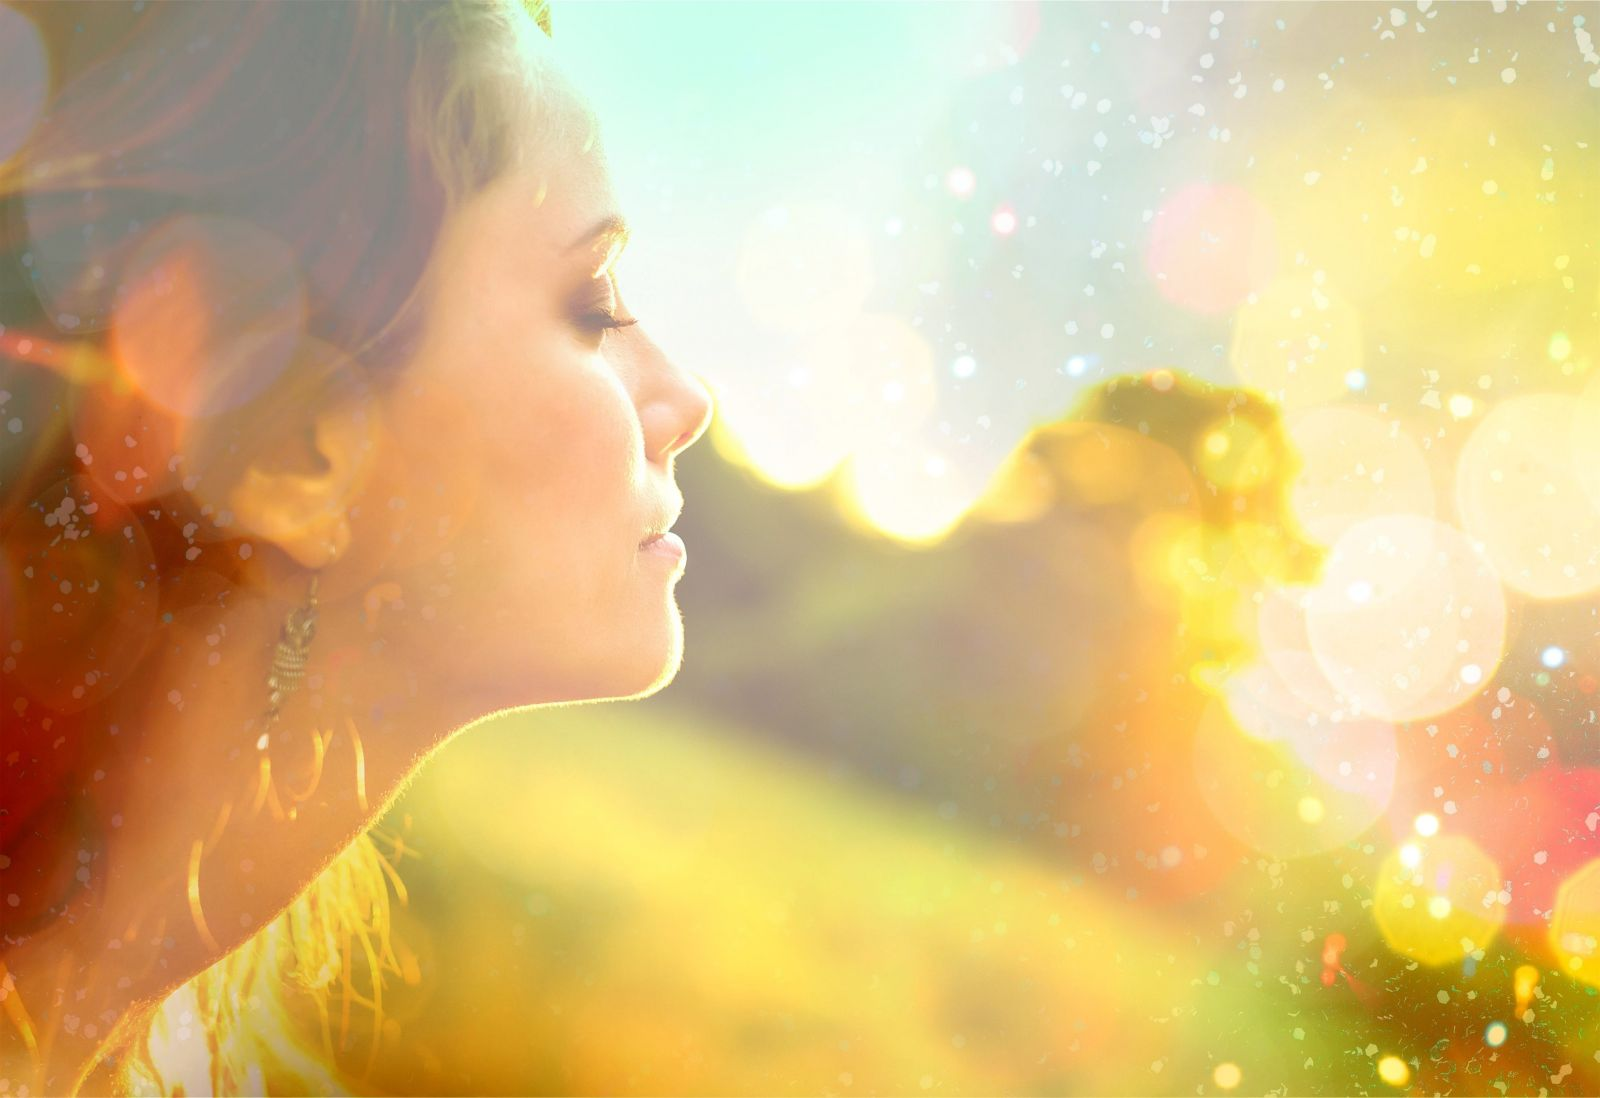 Bio-Zahnheilkunde - Vitamin D3 - Frau Sonne - denecke zahnmedizin